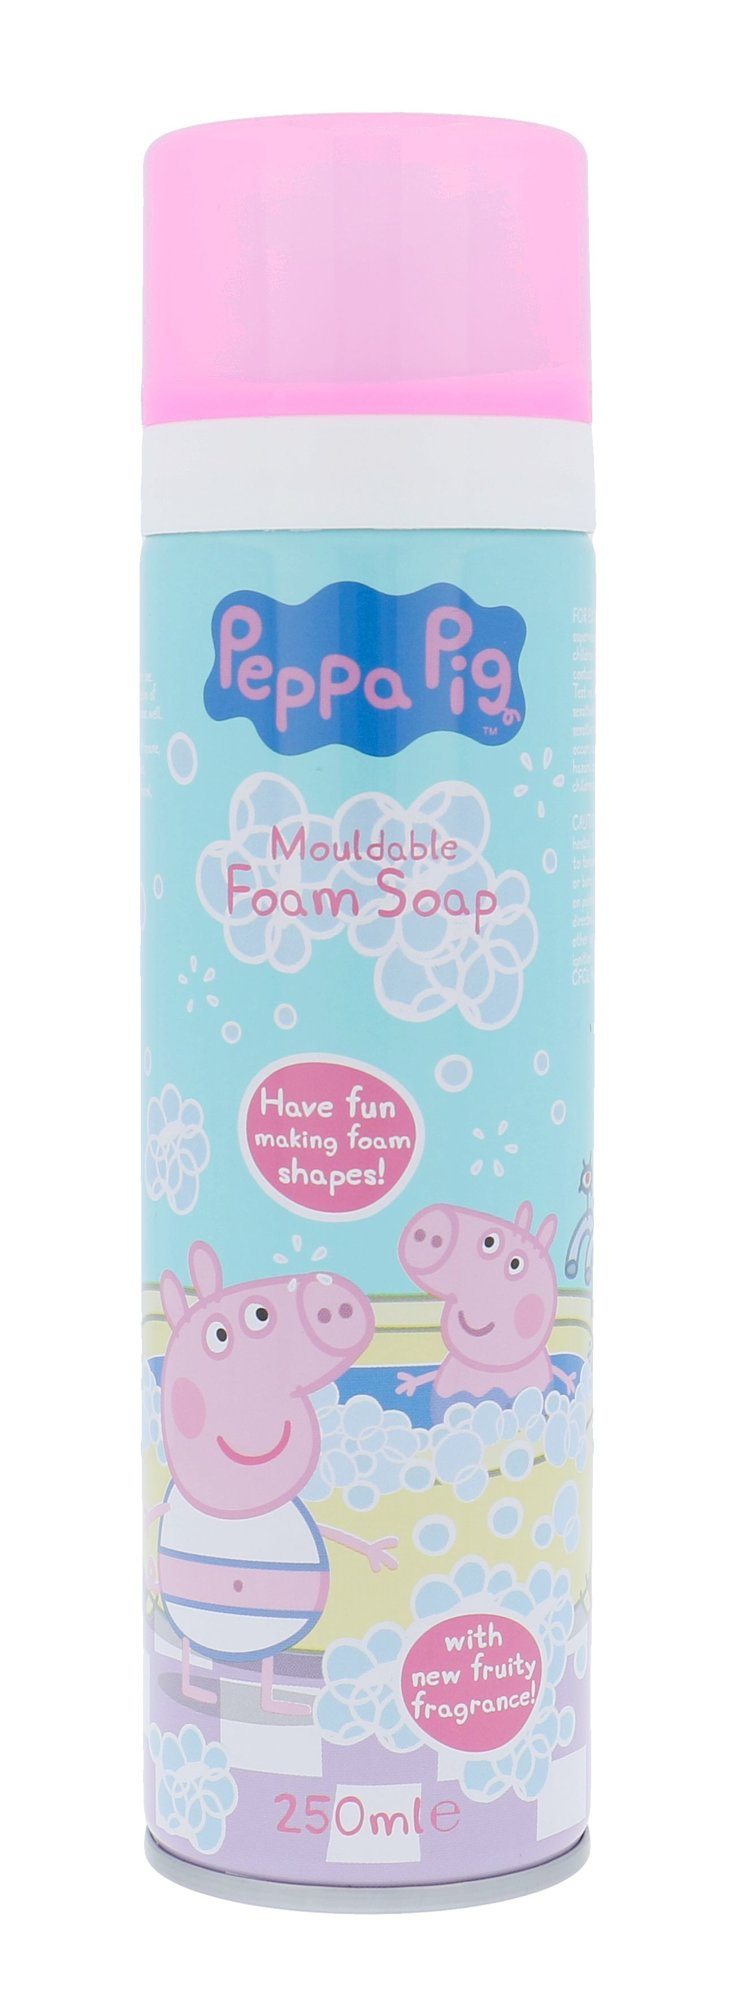 Peppa Pig Peppa Cosmetic 250ml  Mouldable Foam Soap